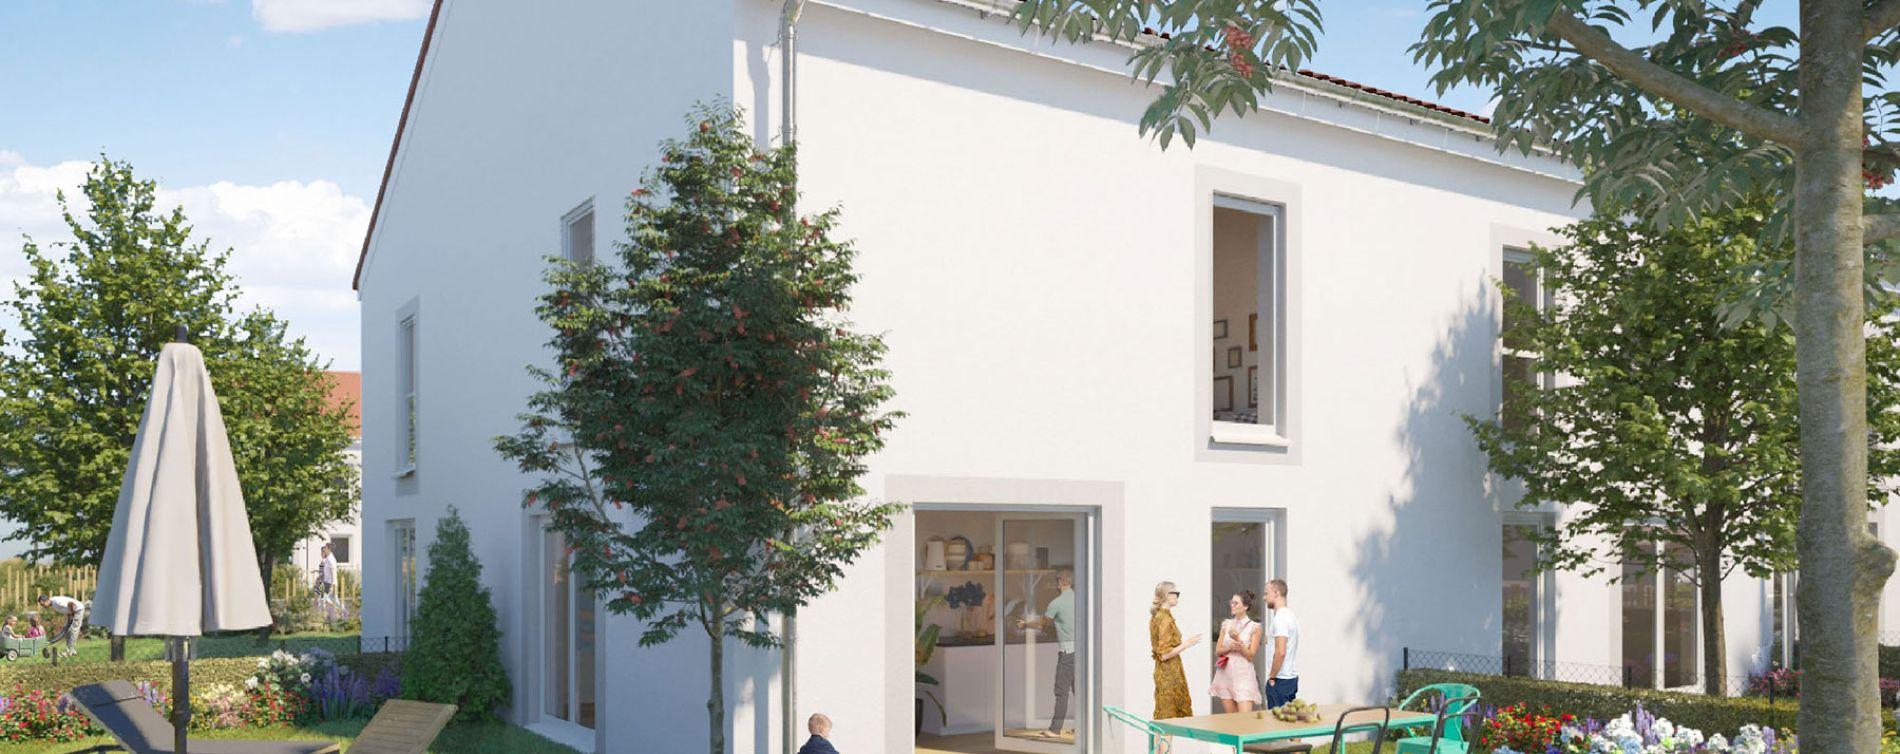 Neuves-Maisons : programme immobilier neuve « Horizons » (2)